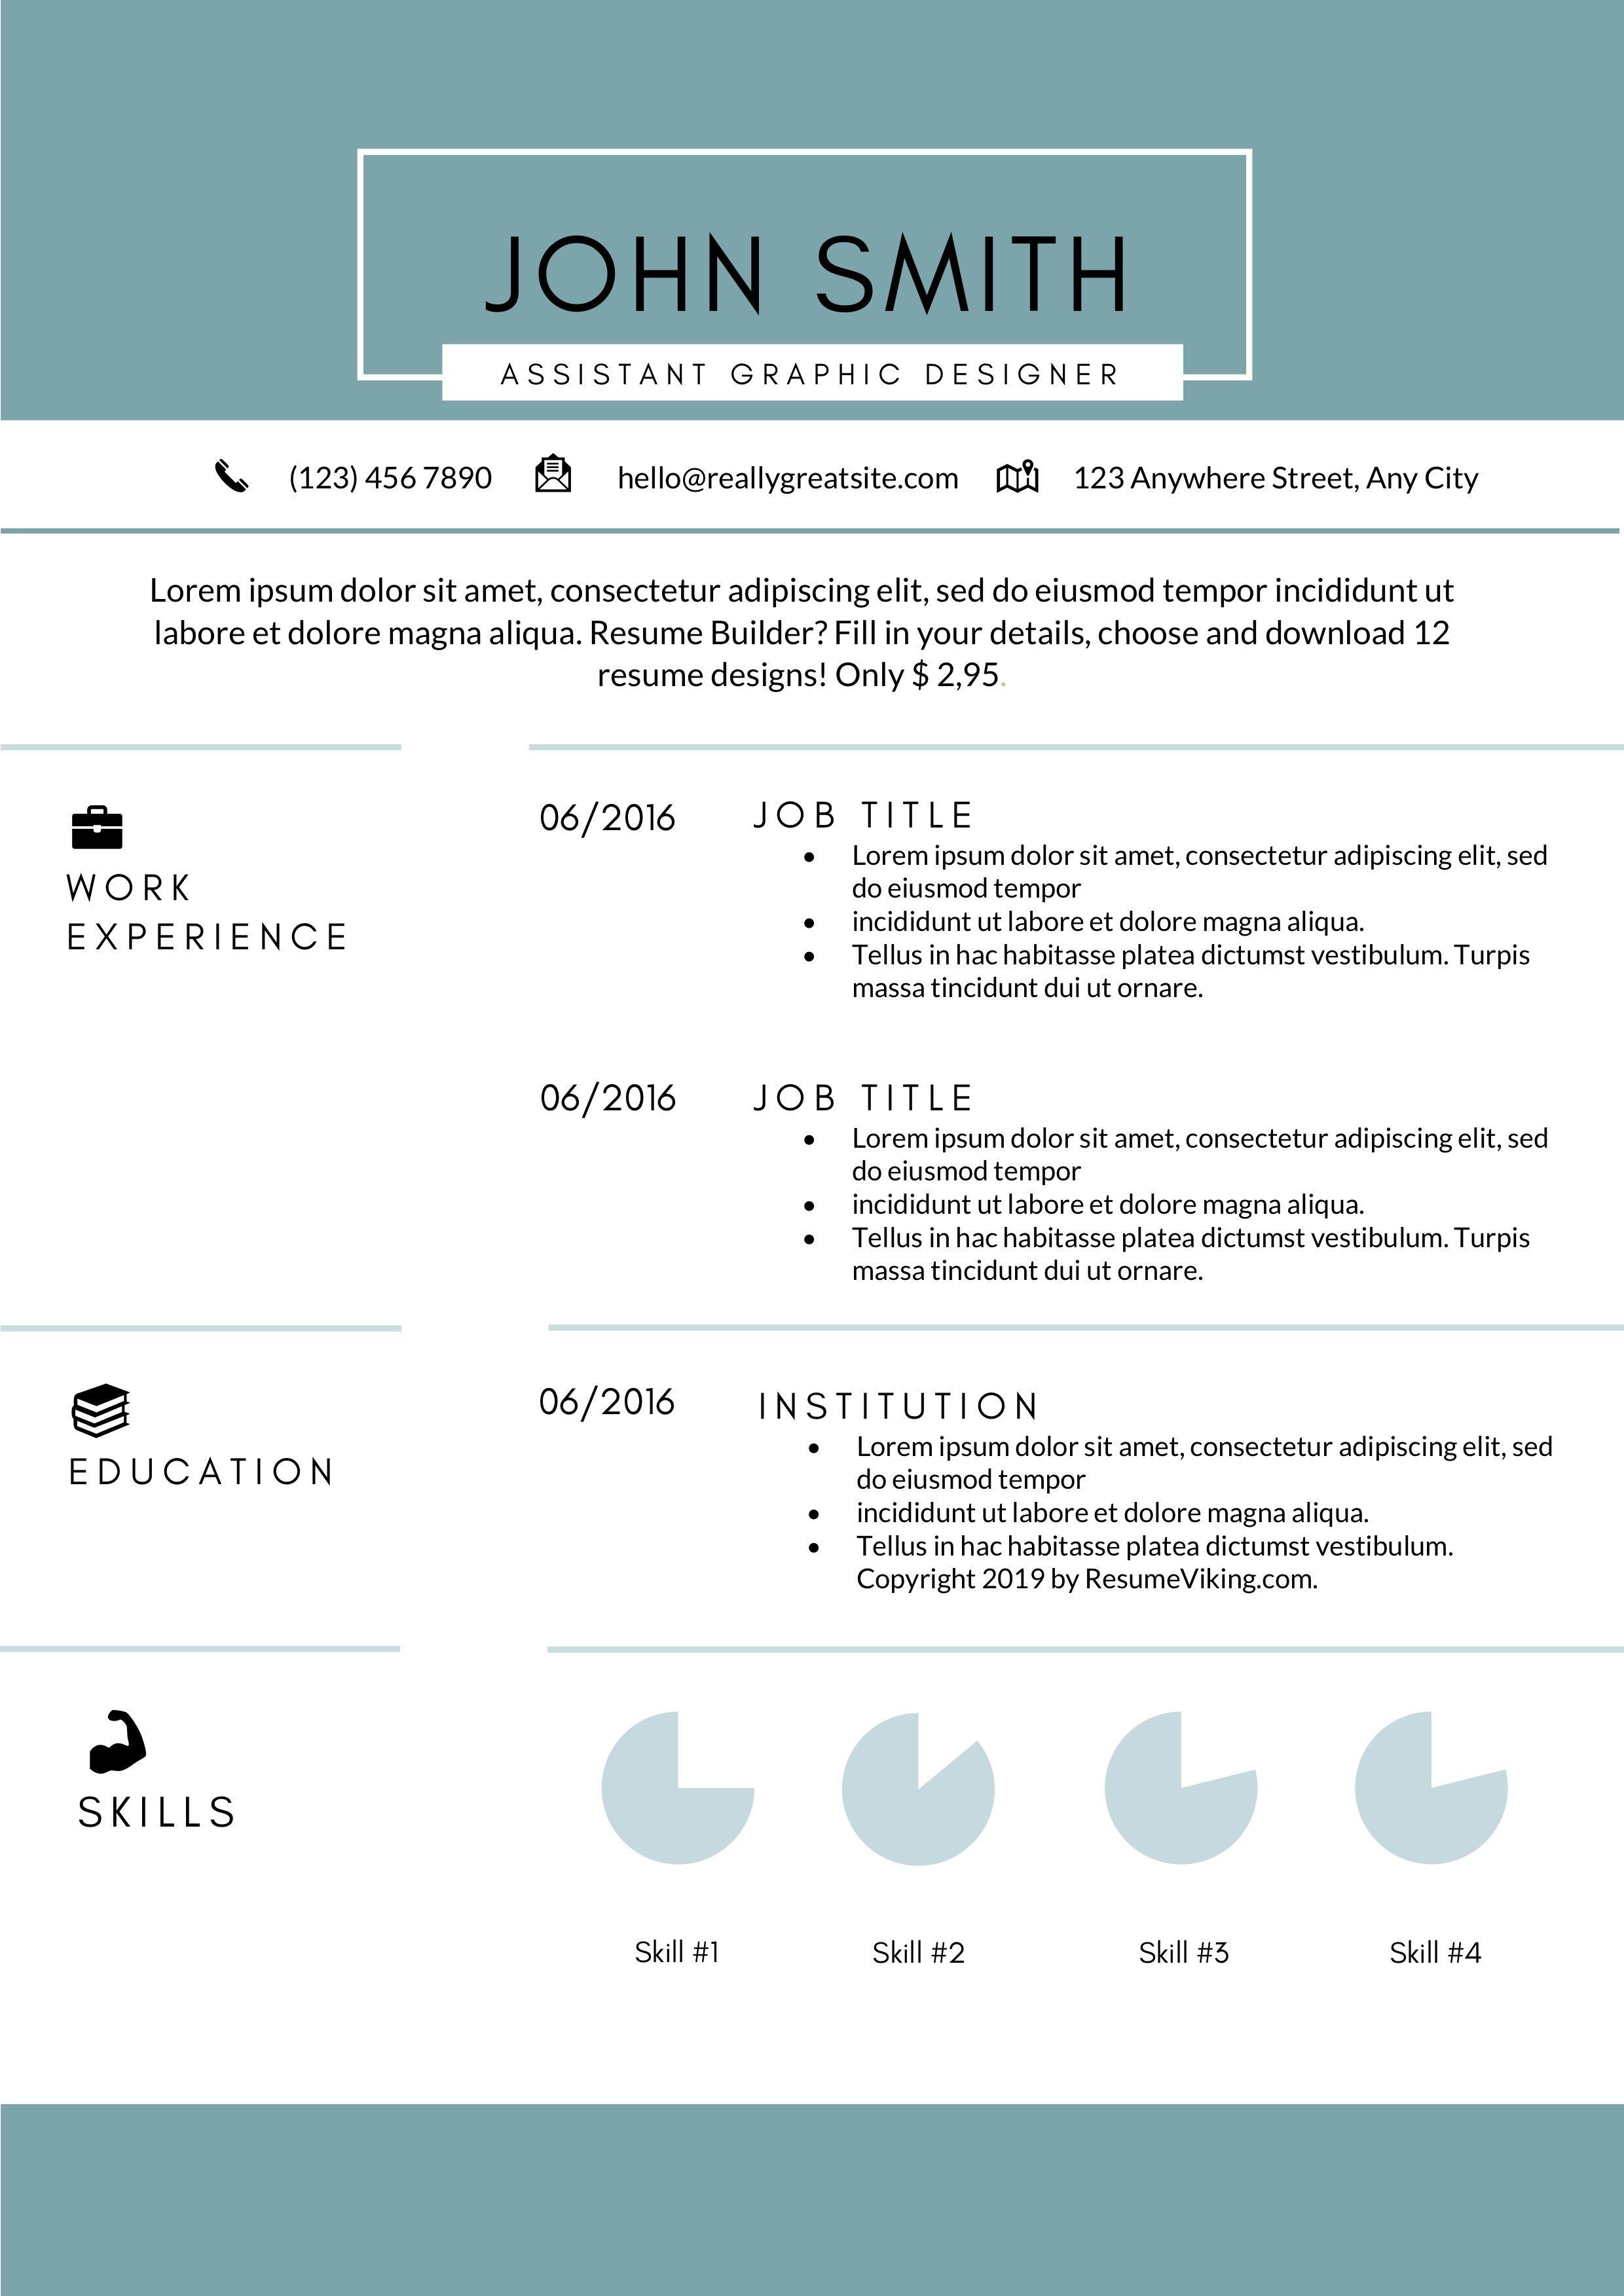 Free MS Word Resume Template Words, Resume template